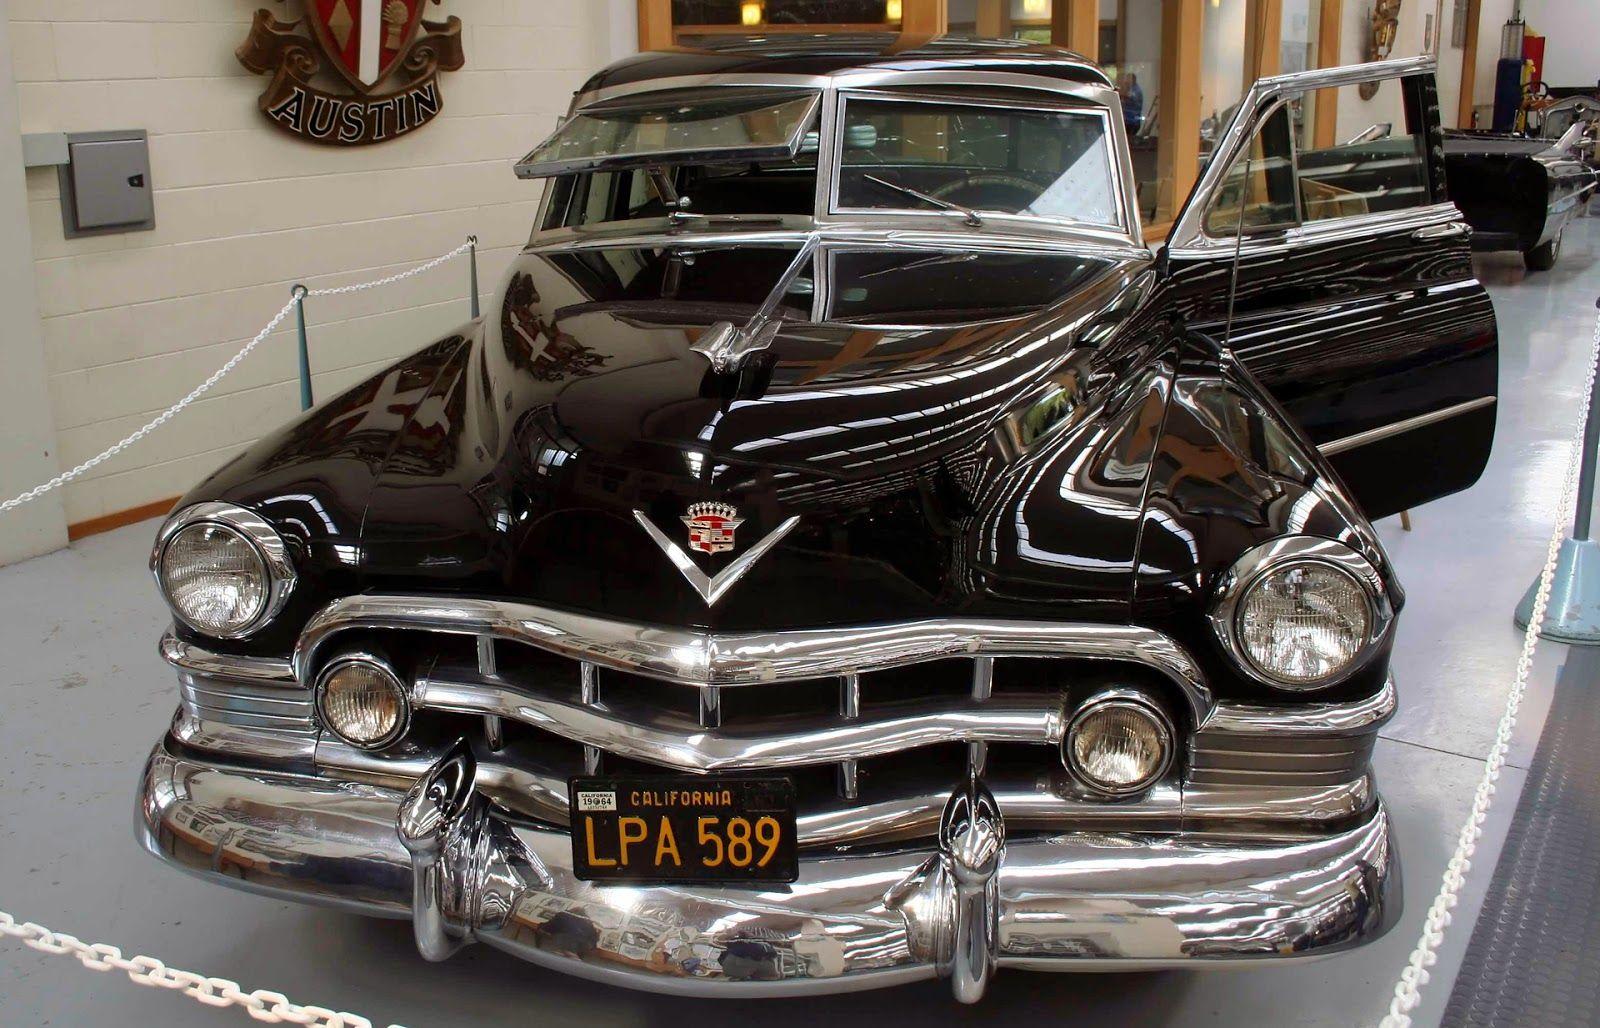 1930s Gangster Cars | transpress nz | cars & machines | Pinterest ...